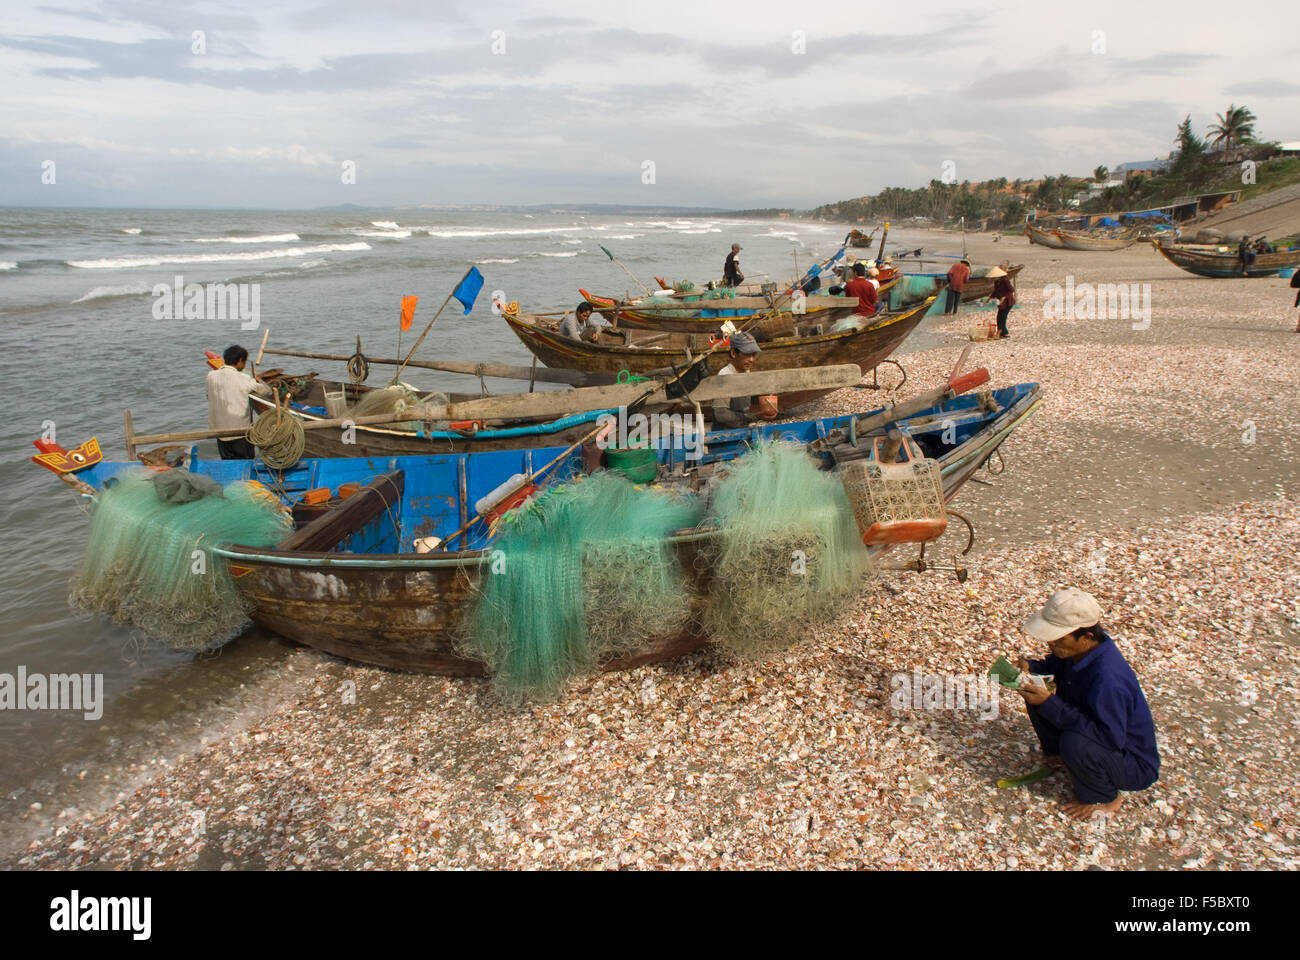 Fishermen in Mui Ne Beach, Vietnam. Fishing Catch. fishing village, Bình Thuận Province, Vietnam. - Stock Image